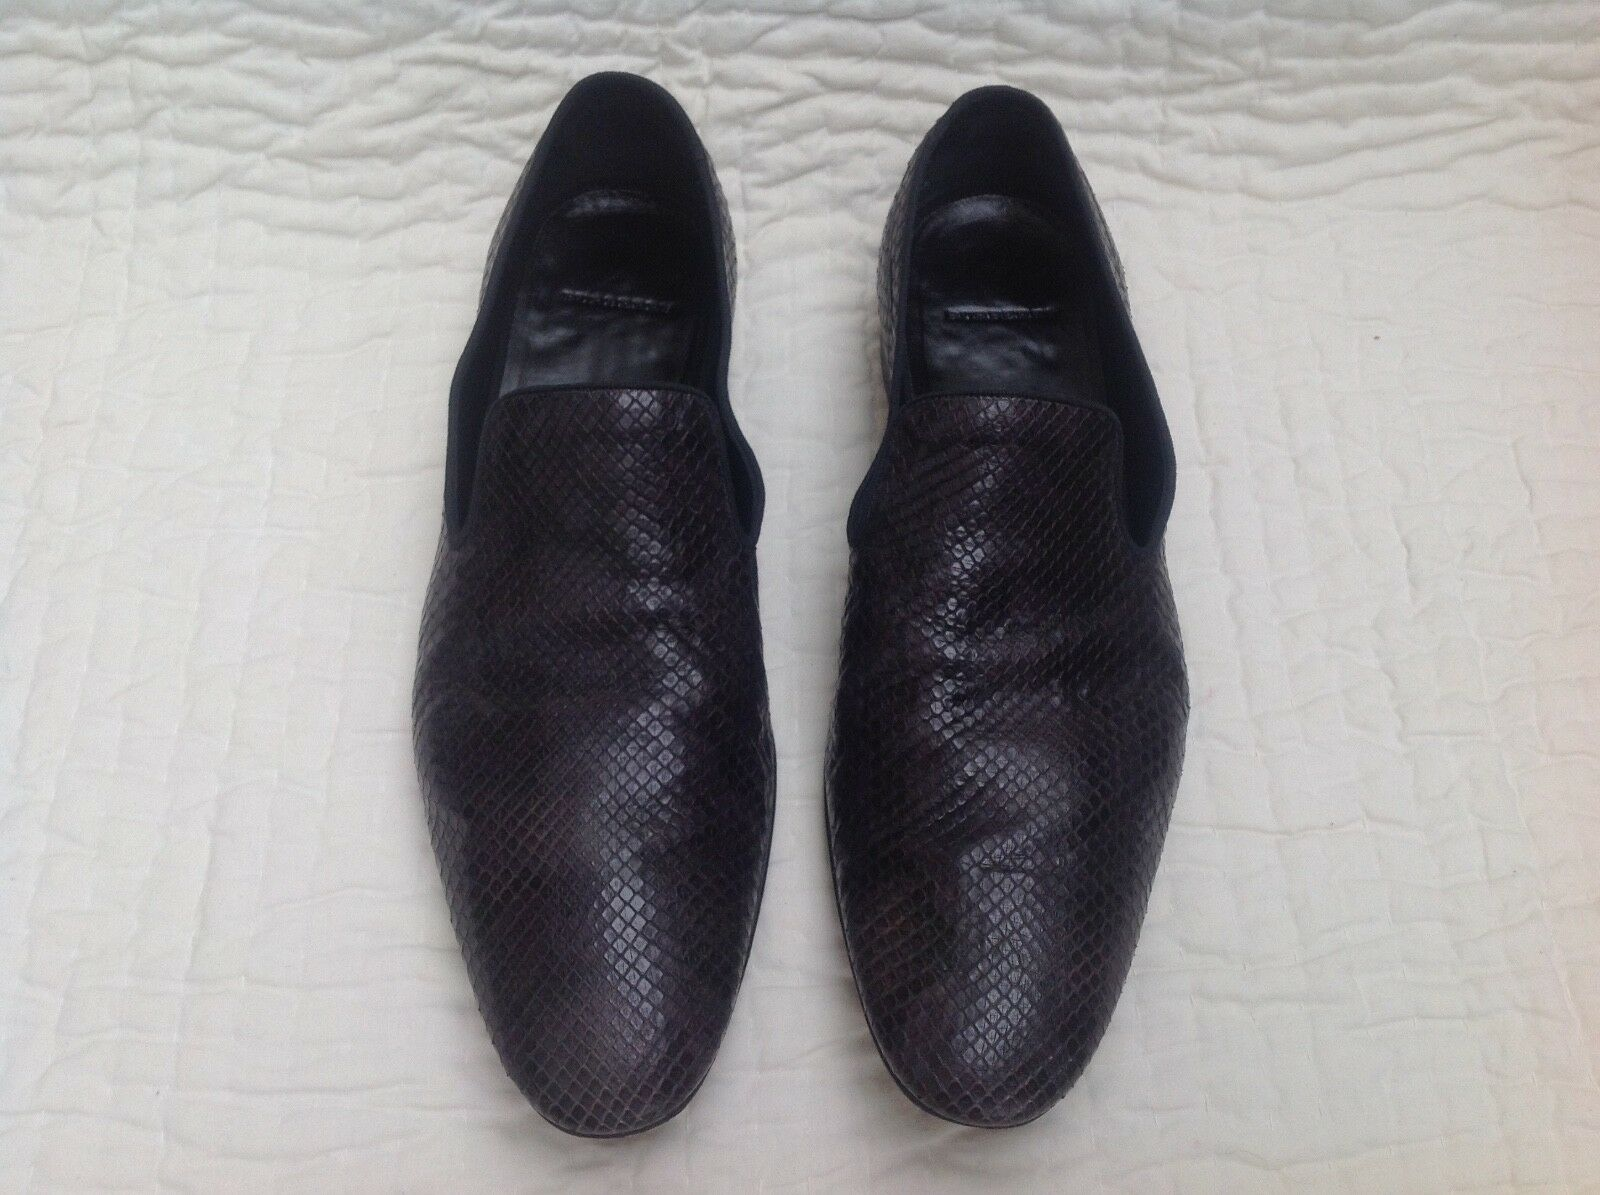 Burberry Python mocassins marron chocolat Peau De De Peau Serpent Chaussures 42 21f3e6